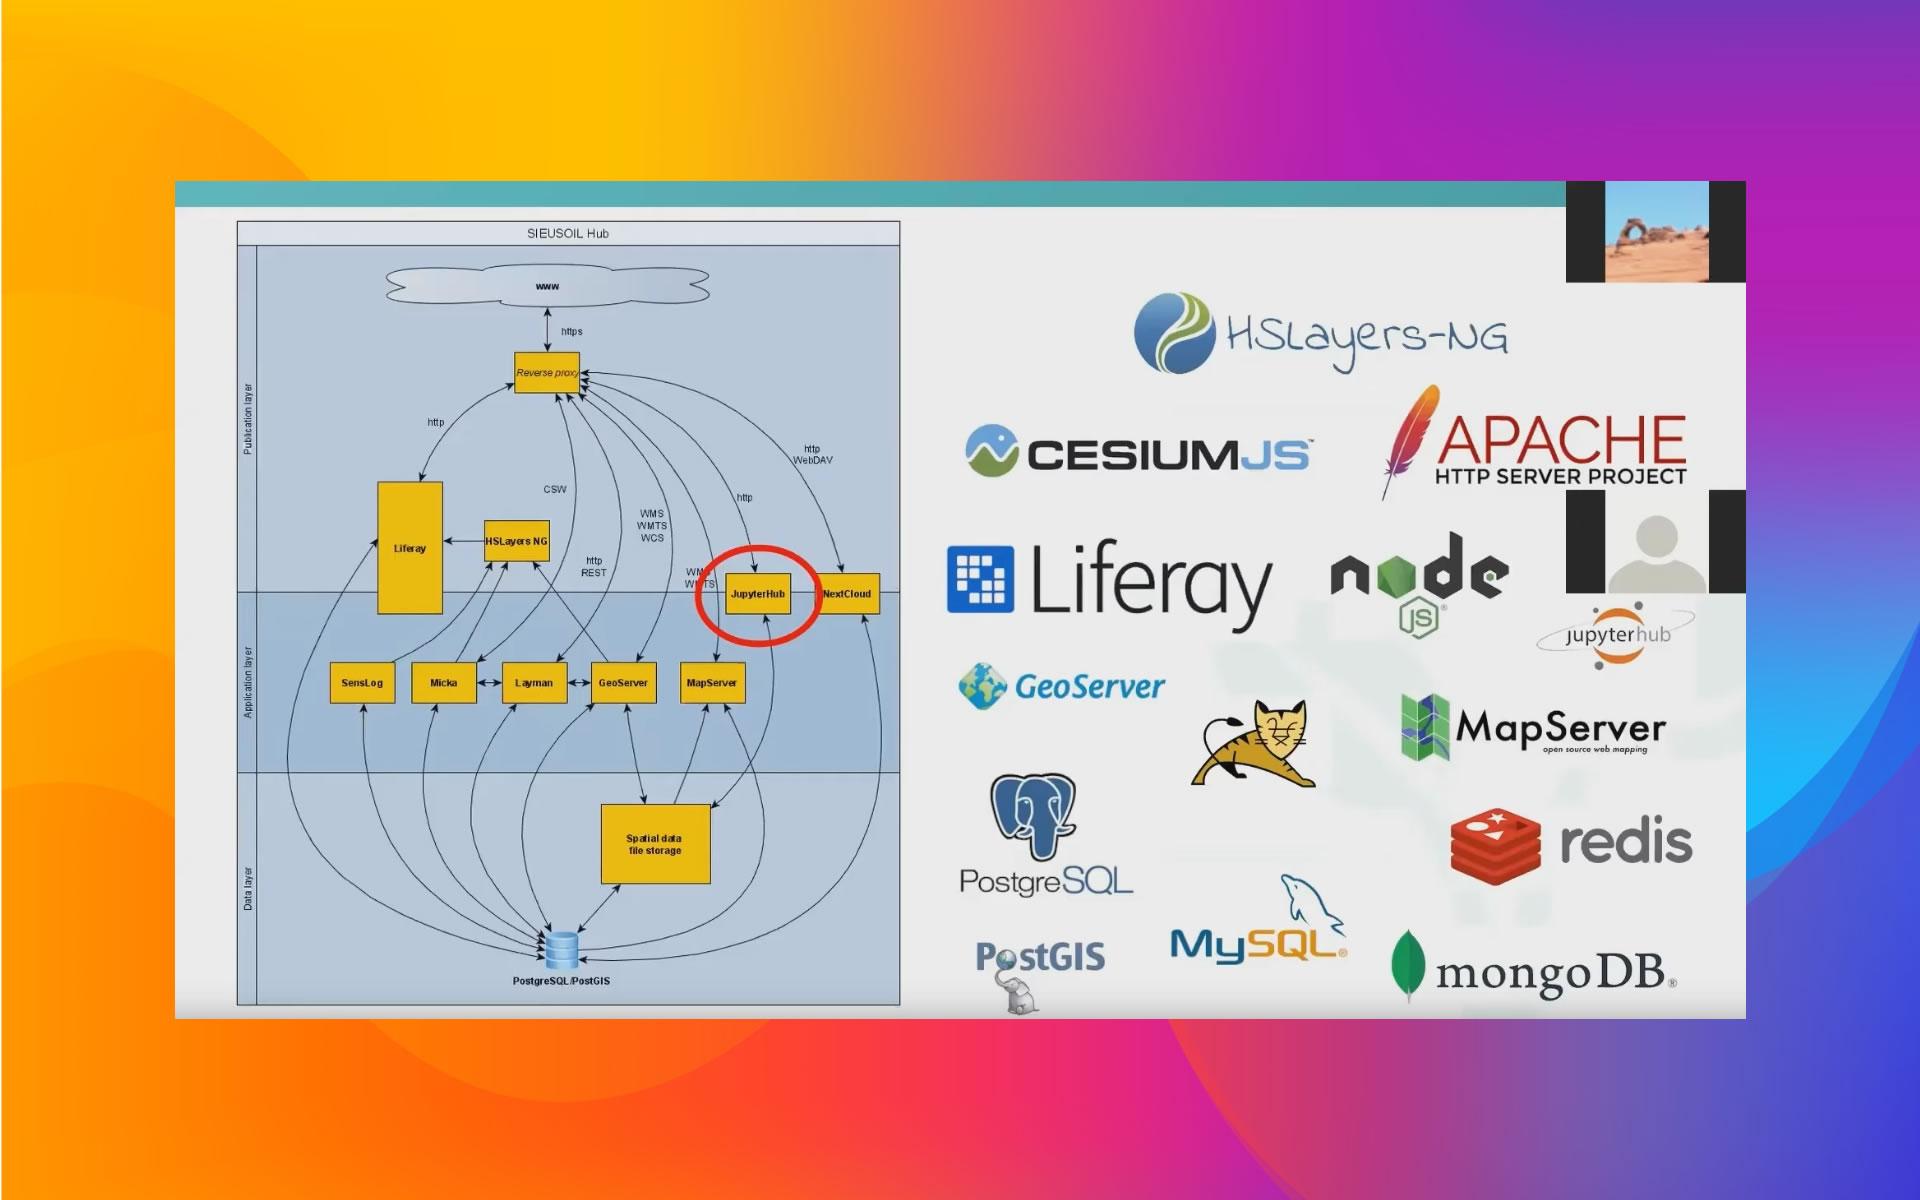 otevrene-jaro-2021-lesprojekt-cloud-webinar-g